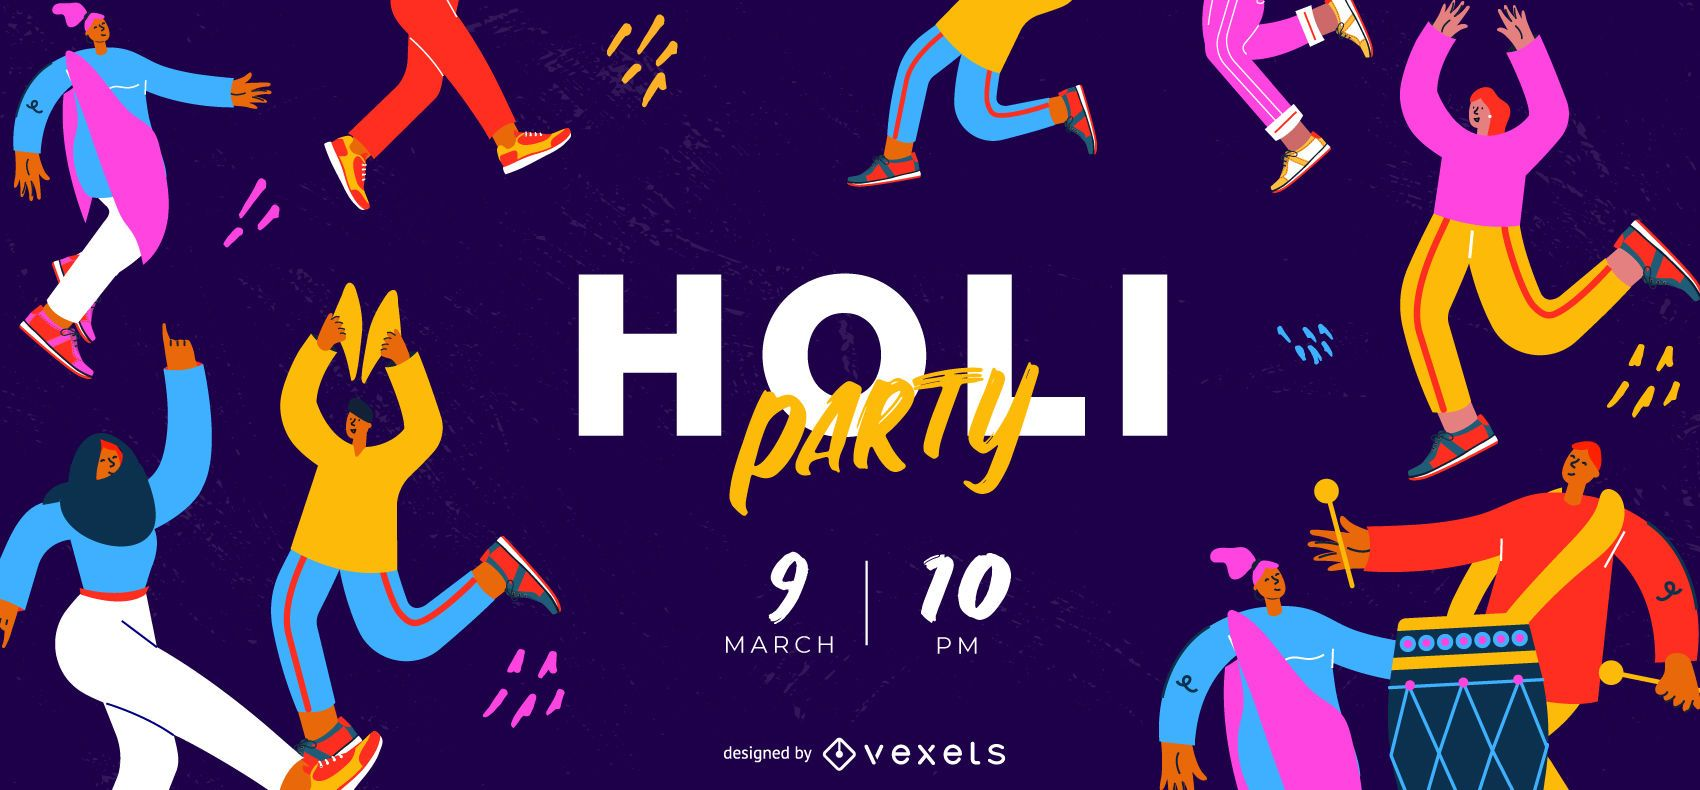 Diseño de control deslizante web Holi Festival Party